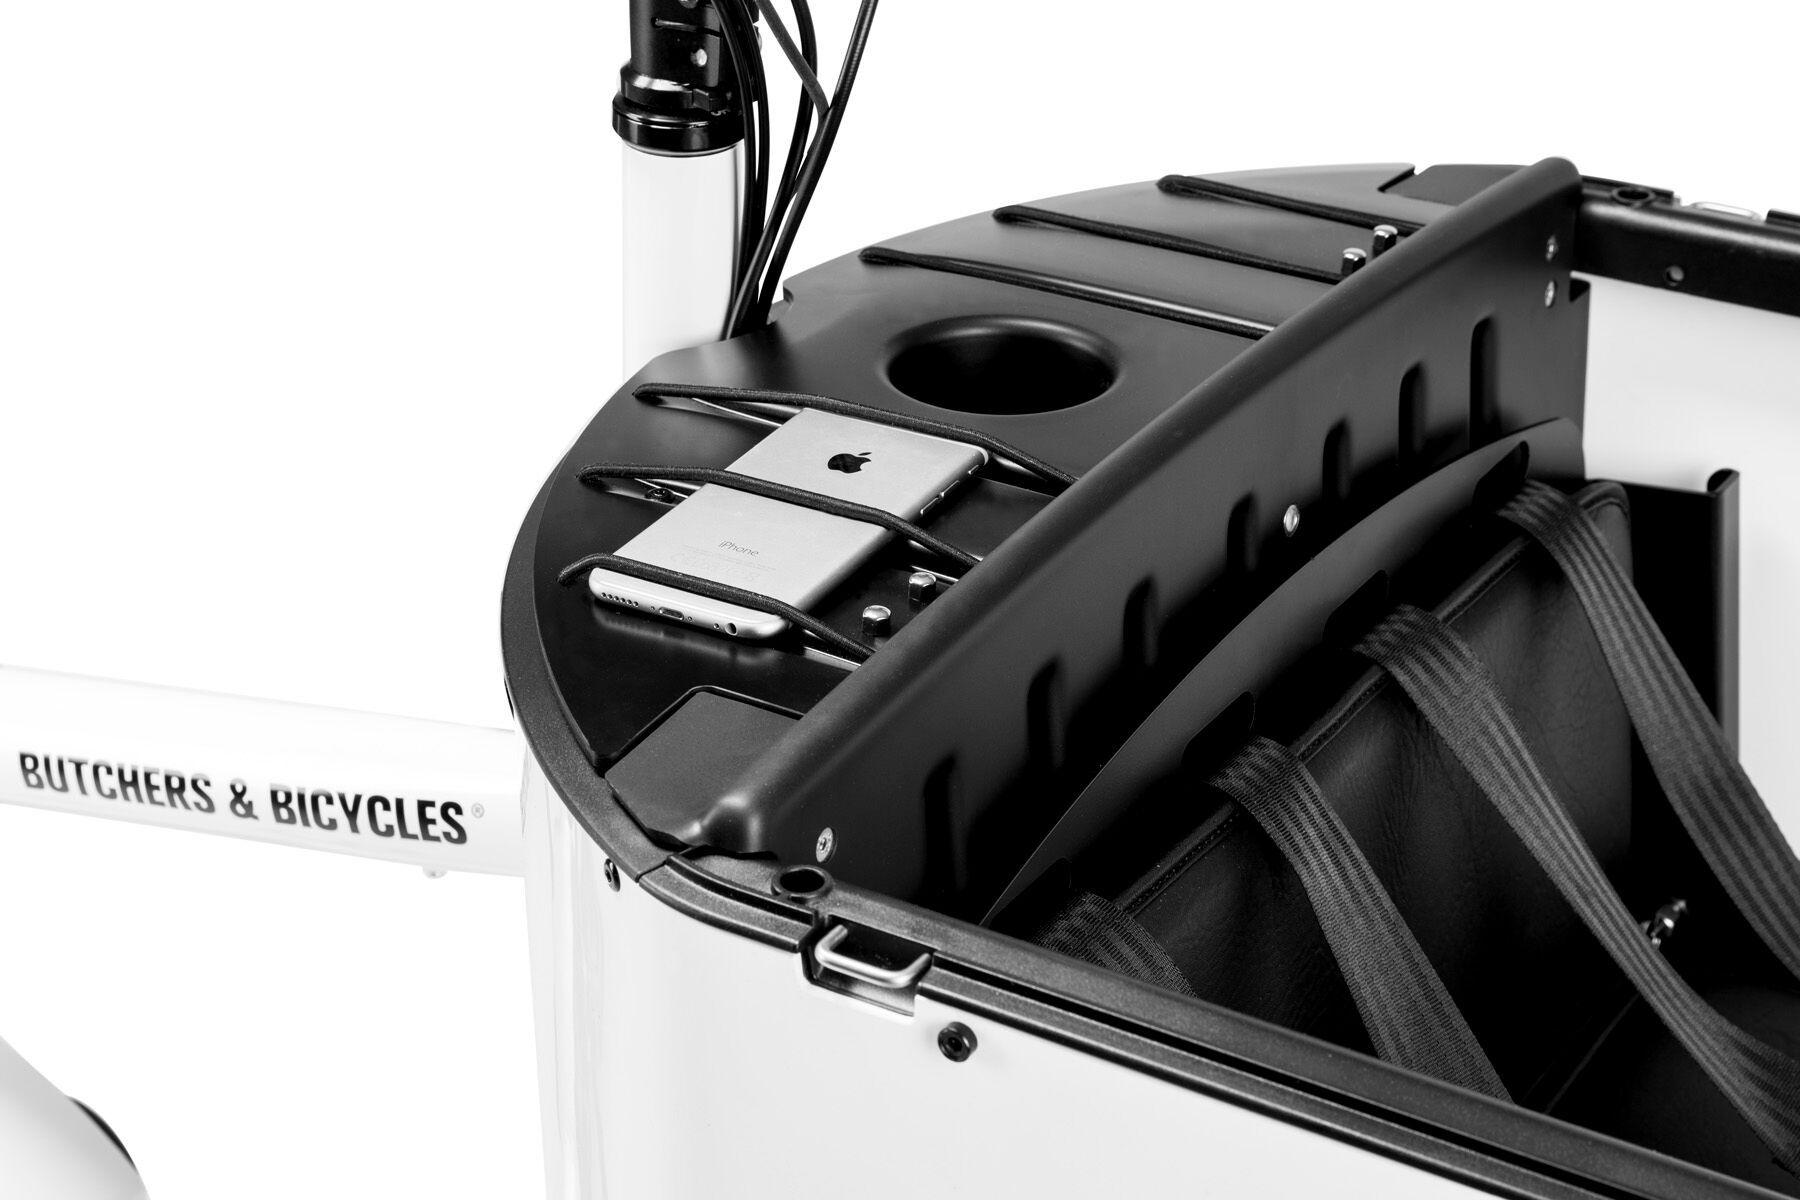 Telefoonopberging Butchers & Bicycles MK1-E